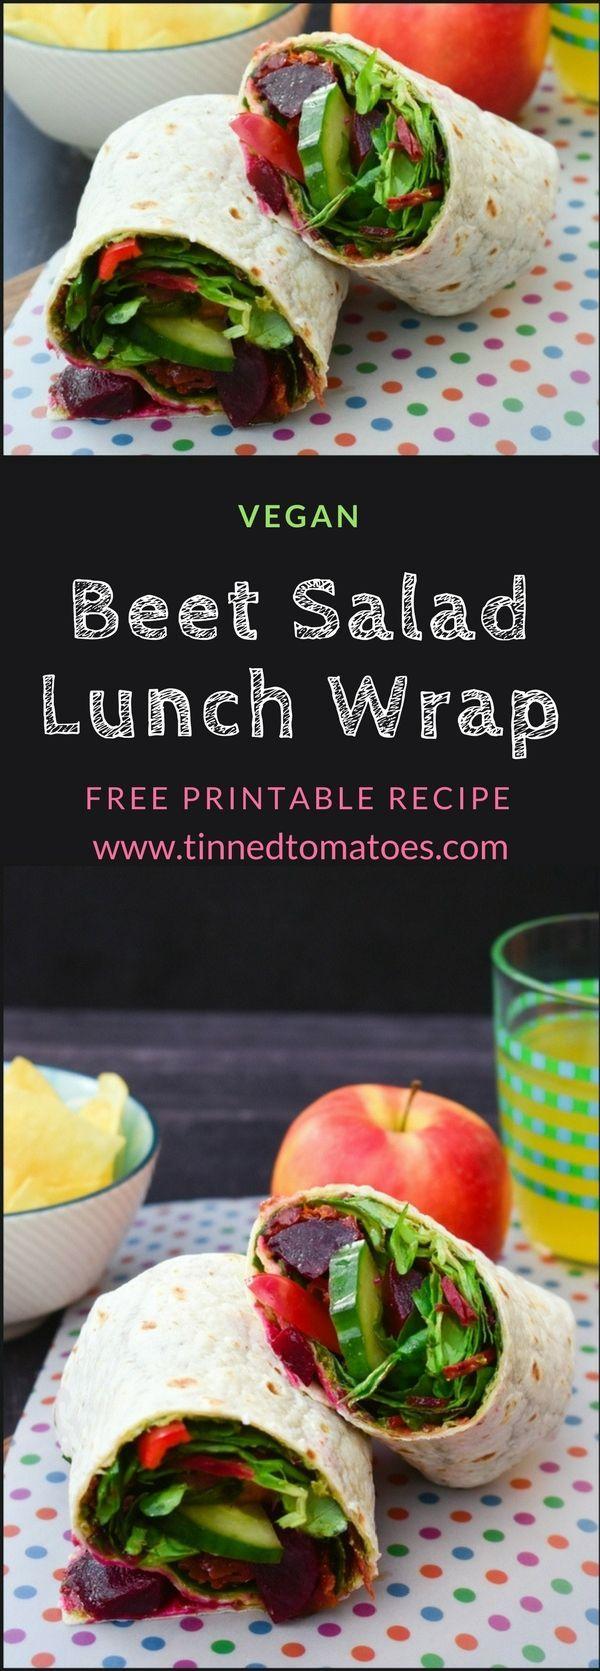 Beet salad lunch wrap